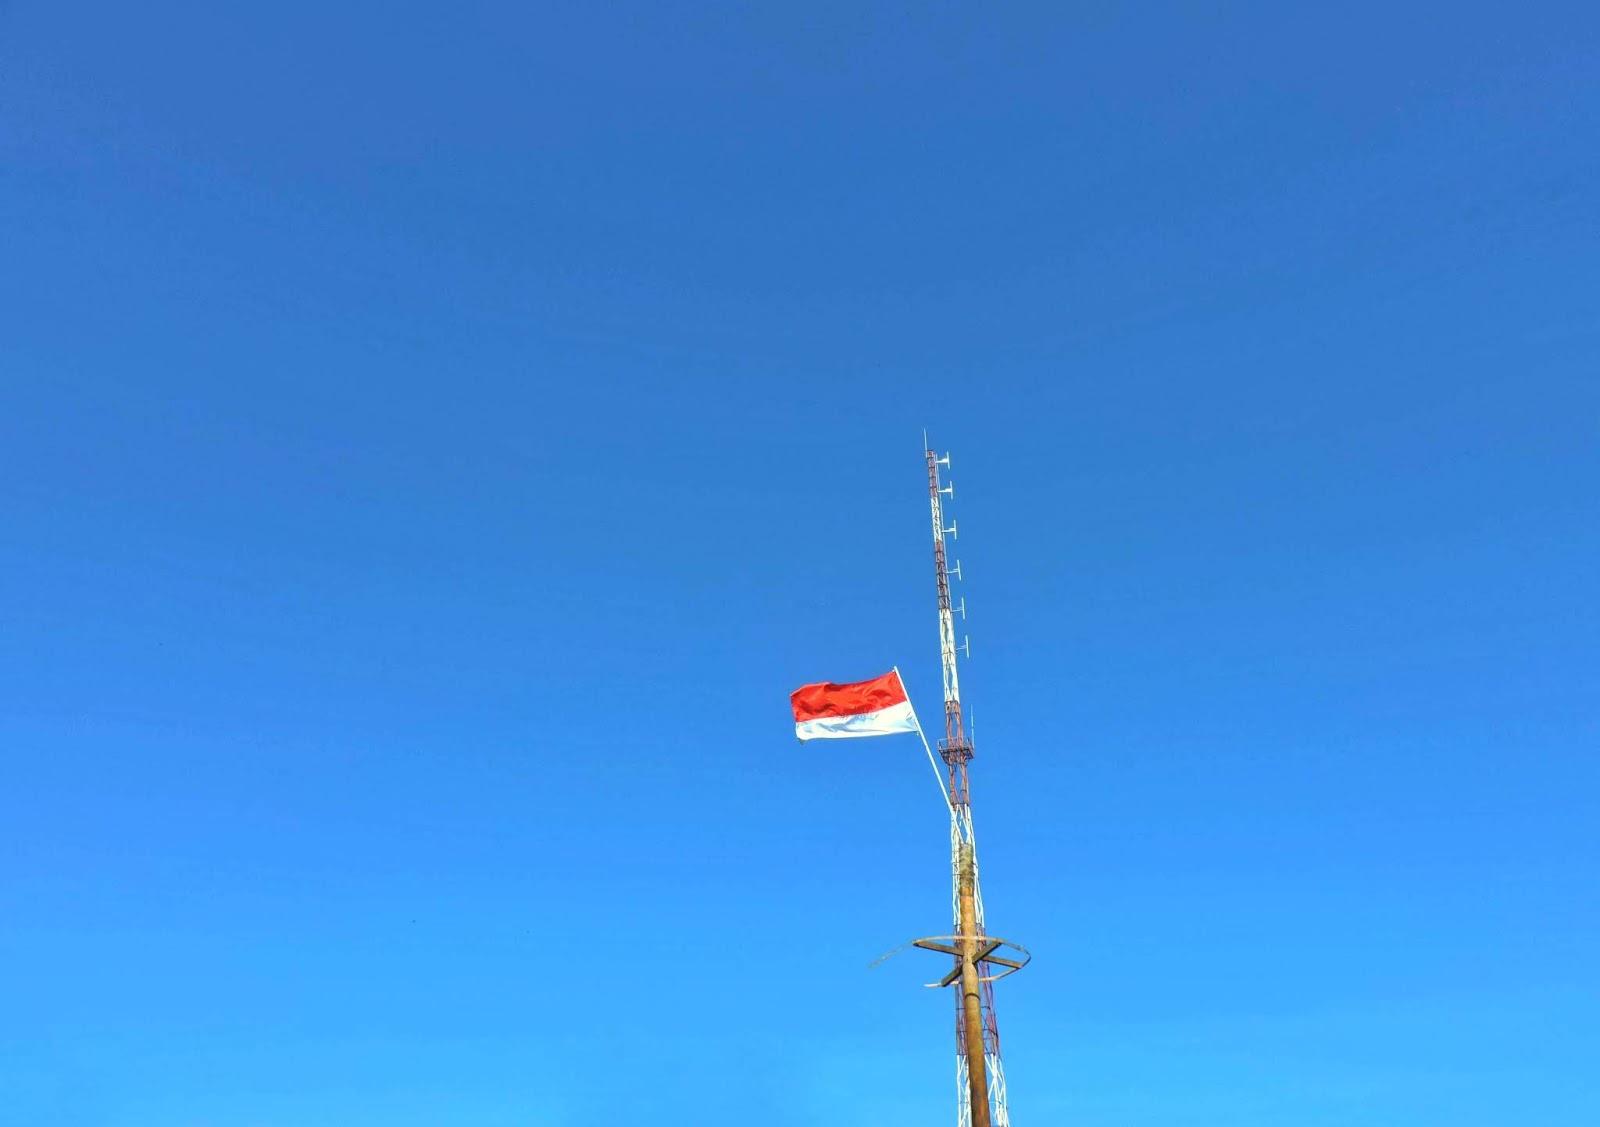 Waroeng Kemarang Rujak Soto Banyuwangi